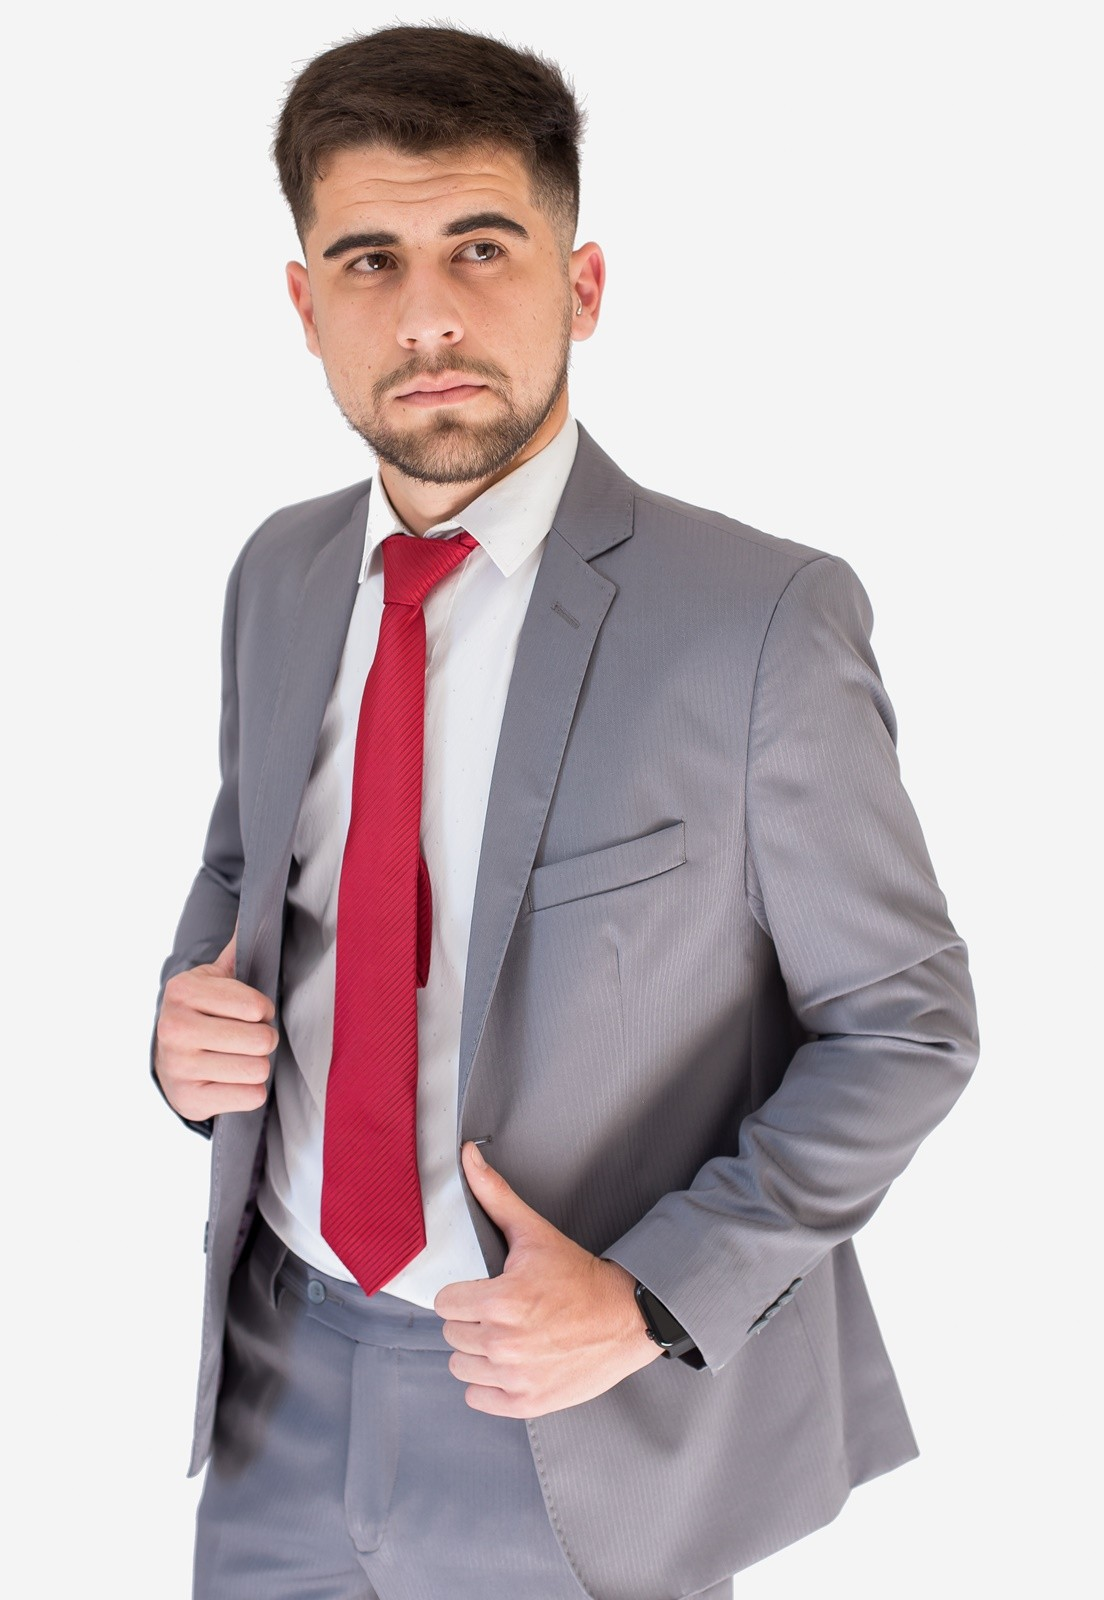 Terno Jordhan Cinza Claro Microfibra Masculino Slim Fit